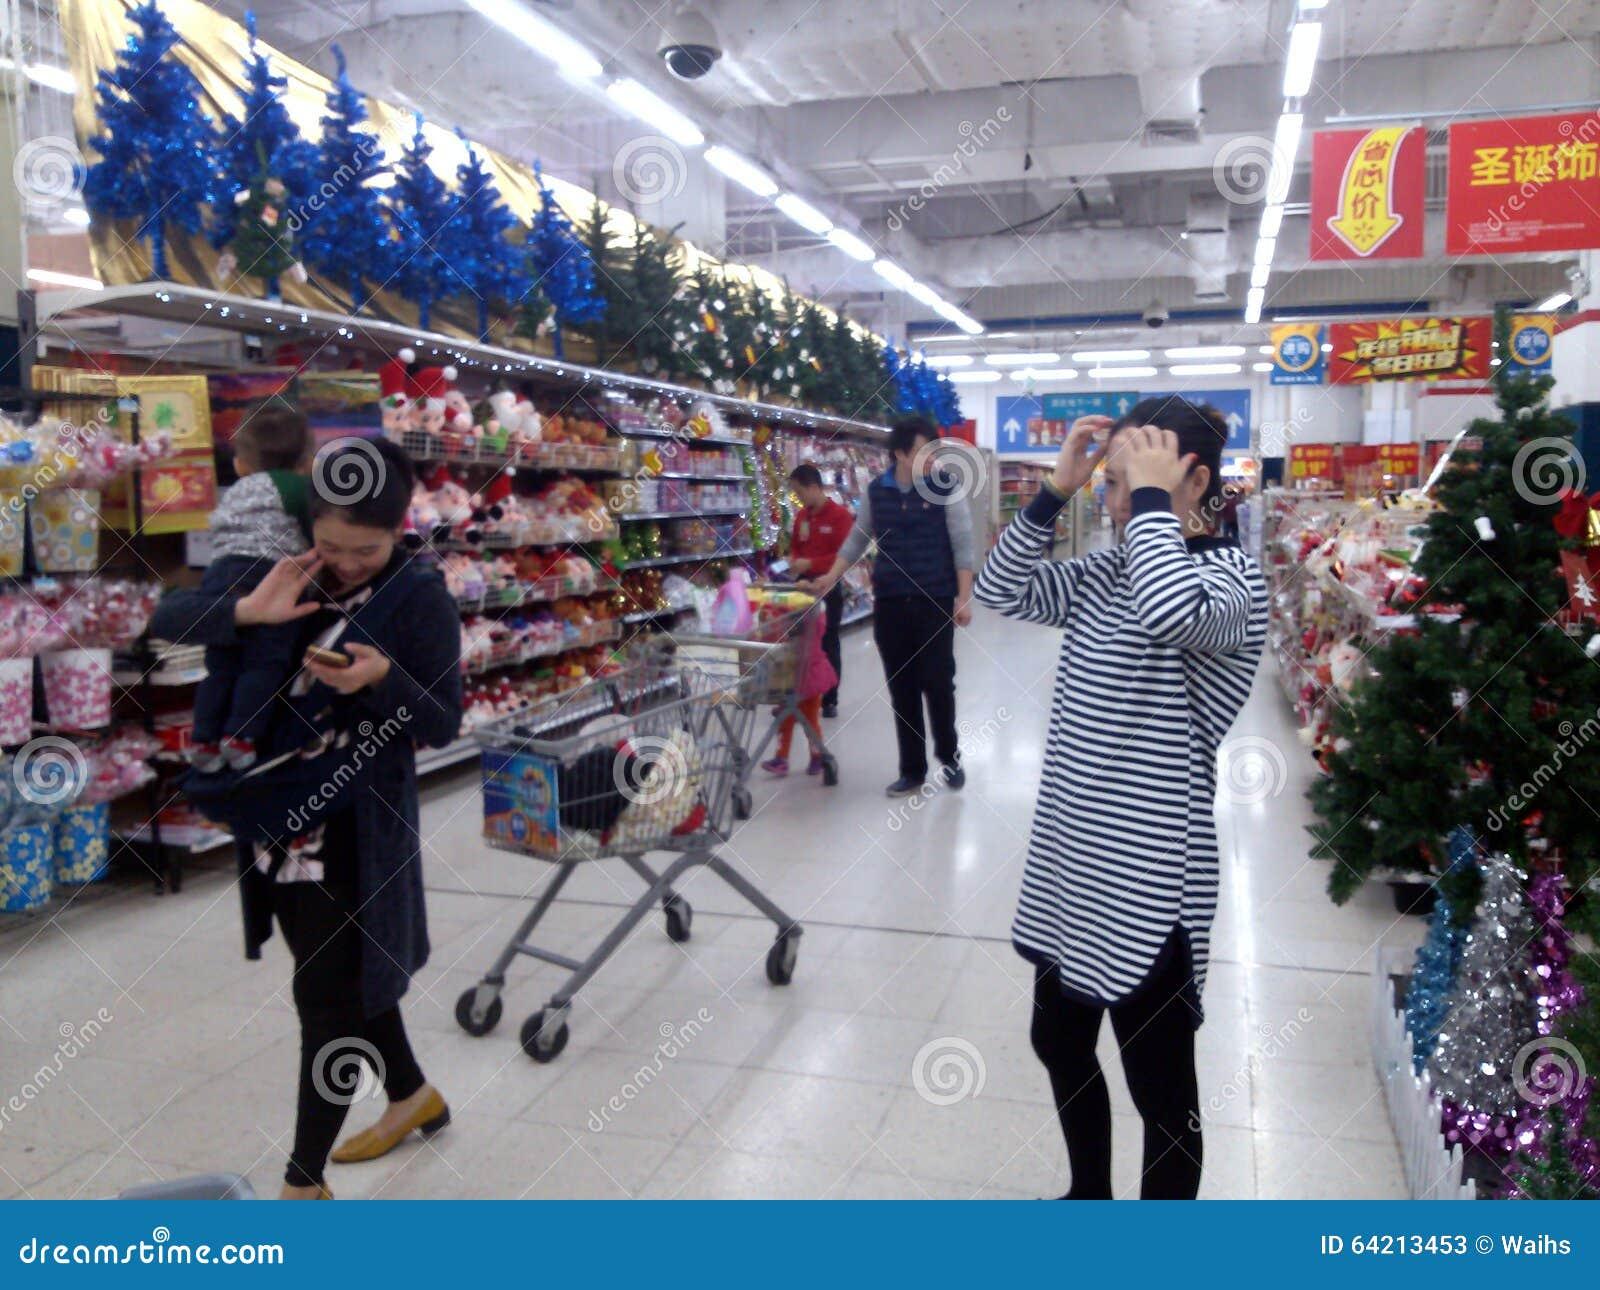 Shenzhen, China: Wal-Mart